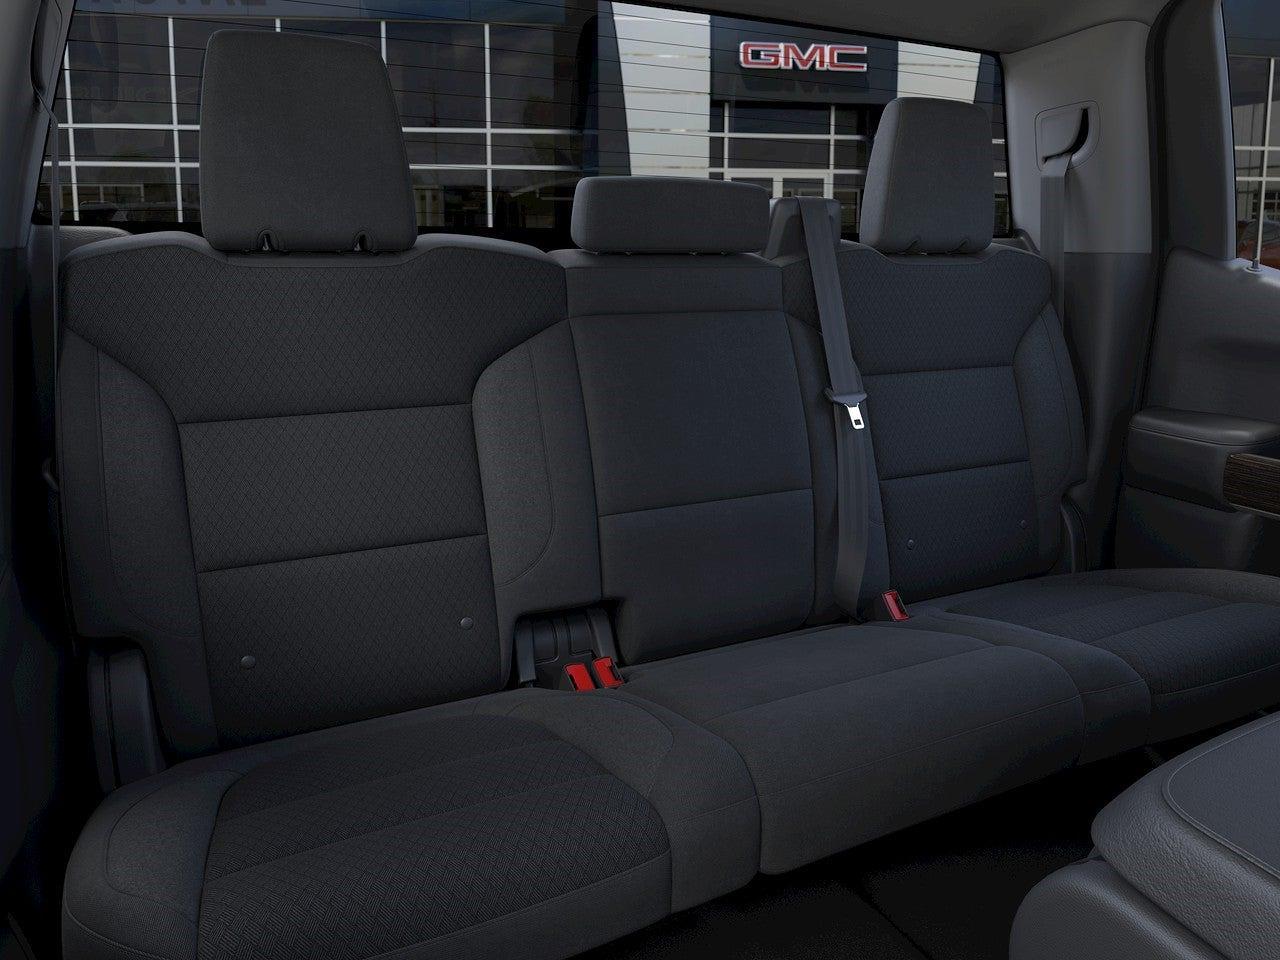 2021 GMC Sierra 1500 Double Cab 4x4, Pickup #V21172 - photo 14